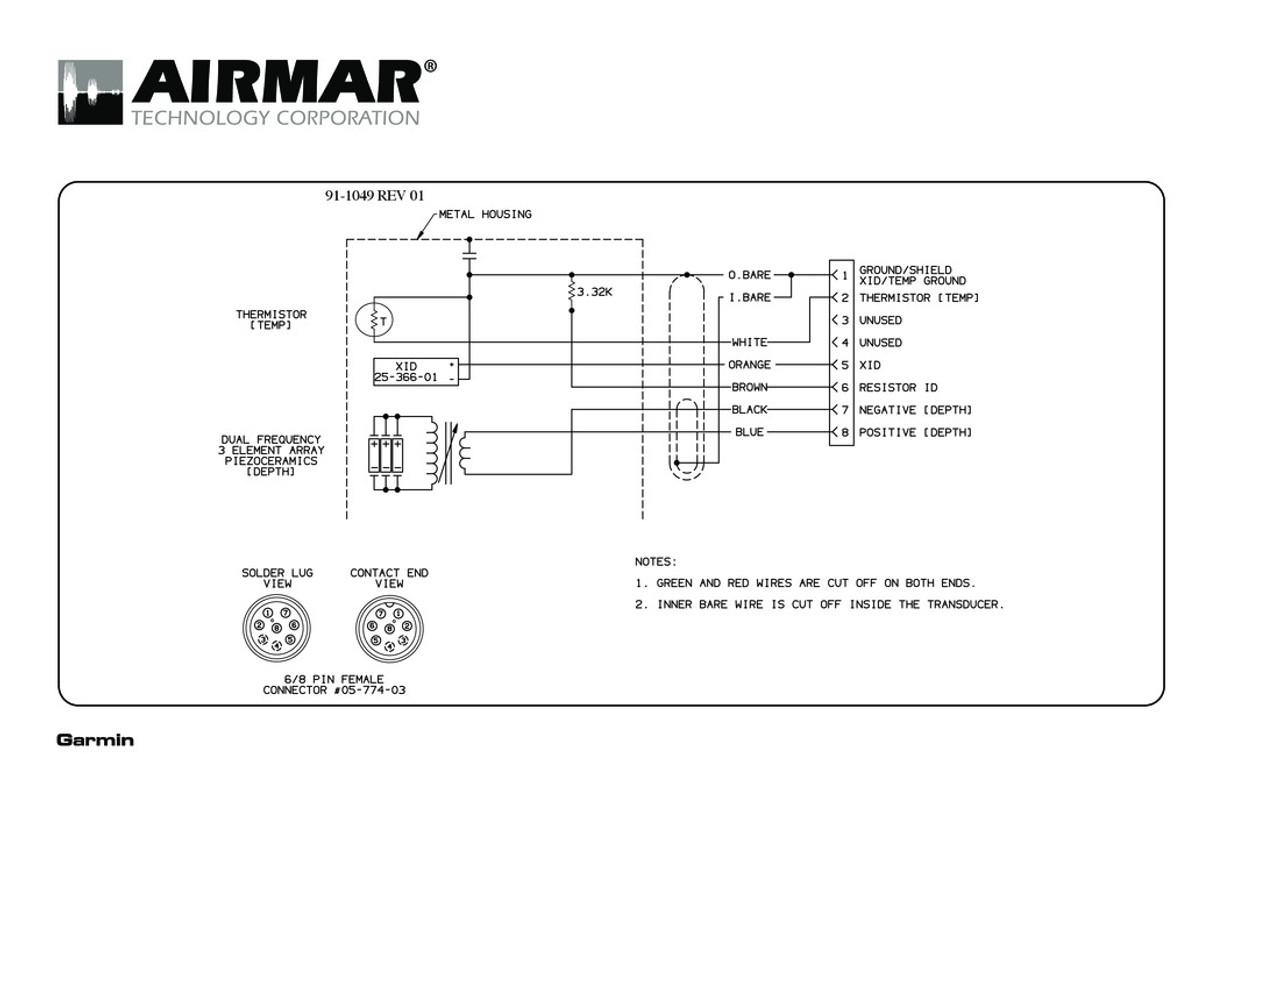 garmin nuvi wiring diagram garmin wiring diagram wiring diagram data  garmin wiring diagram wiring diagram data